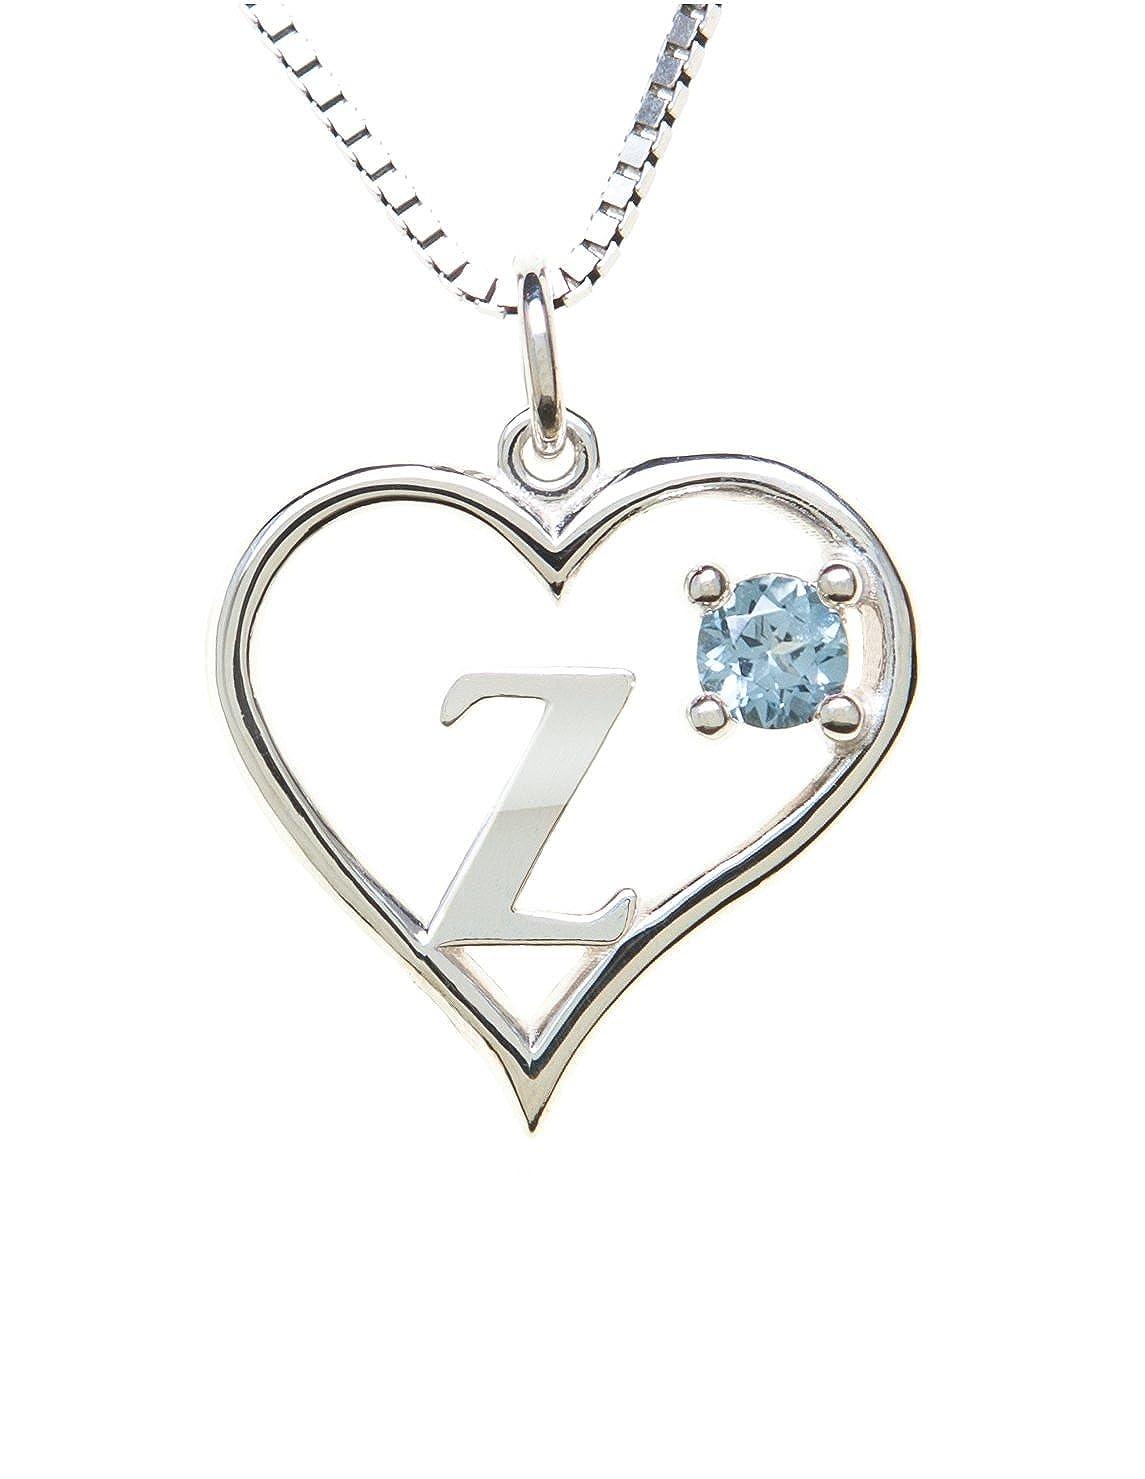 Sterling Silver Pendant Heart /& Letter Z